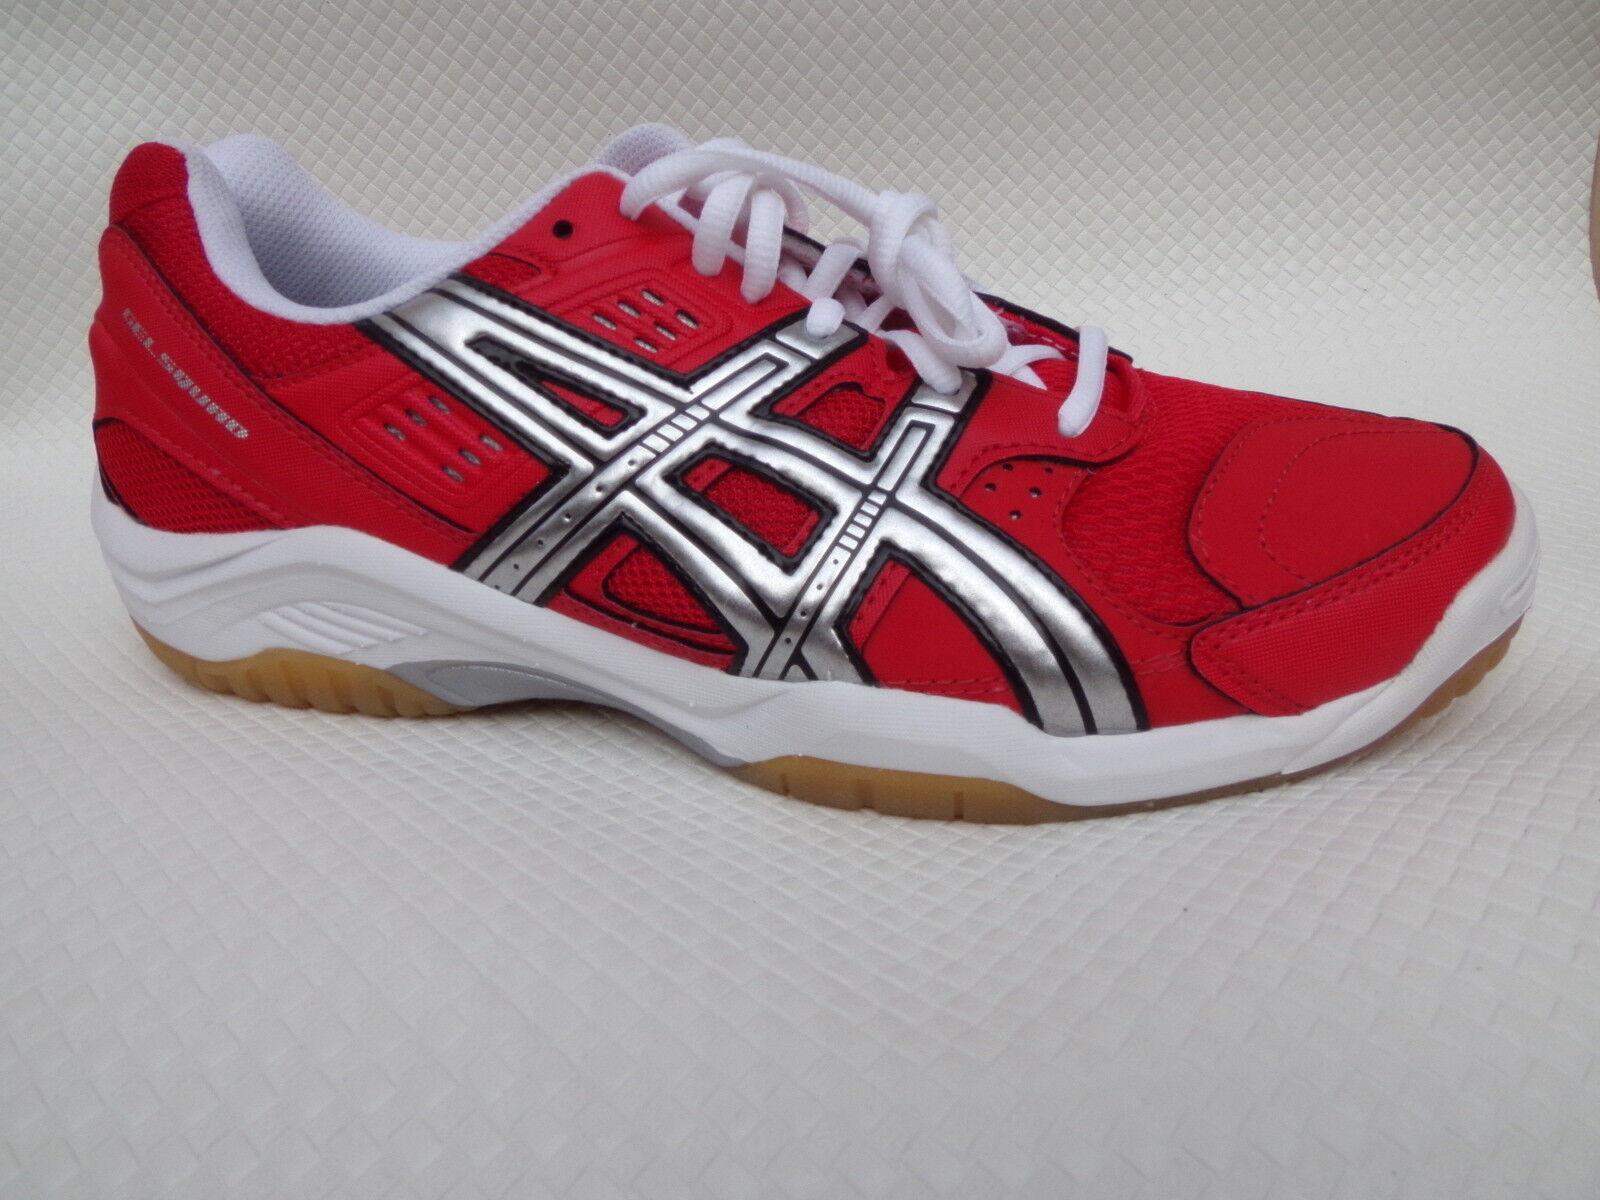 ASICS GEL SQUAD red/white  Indoor / Handball